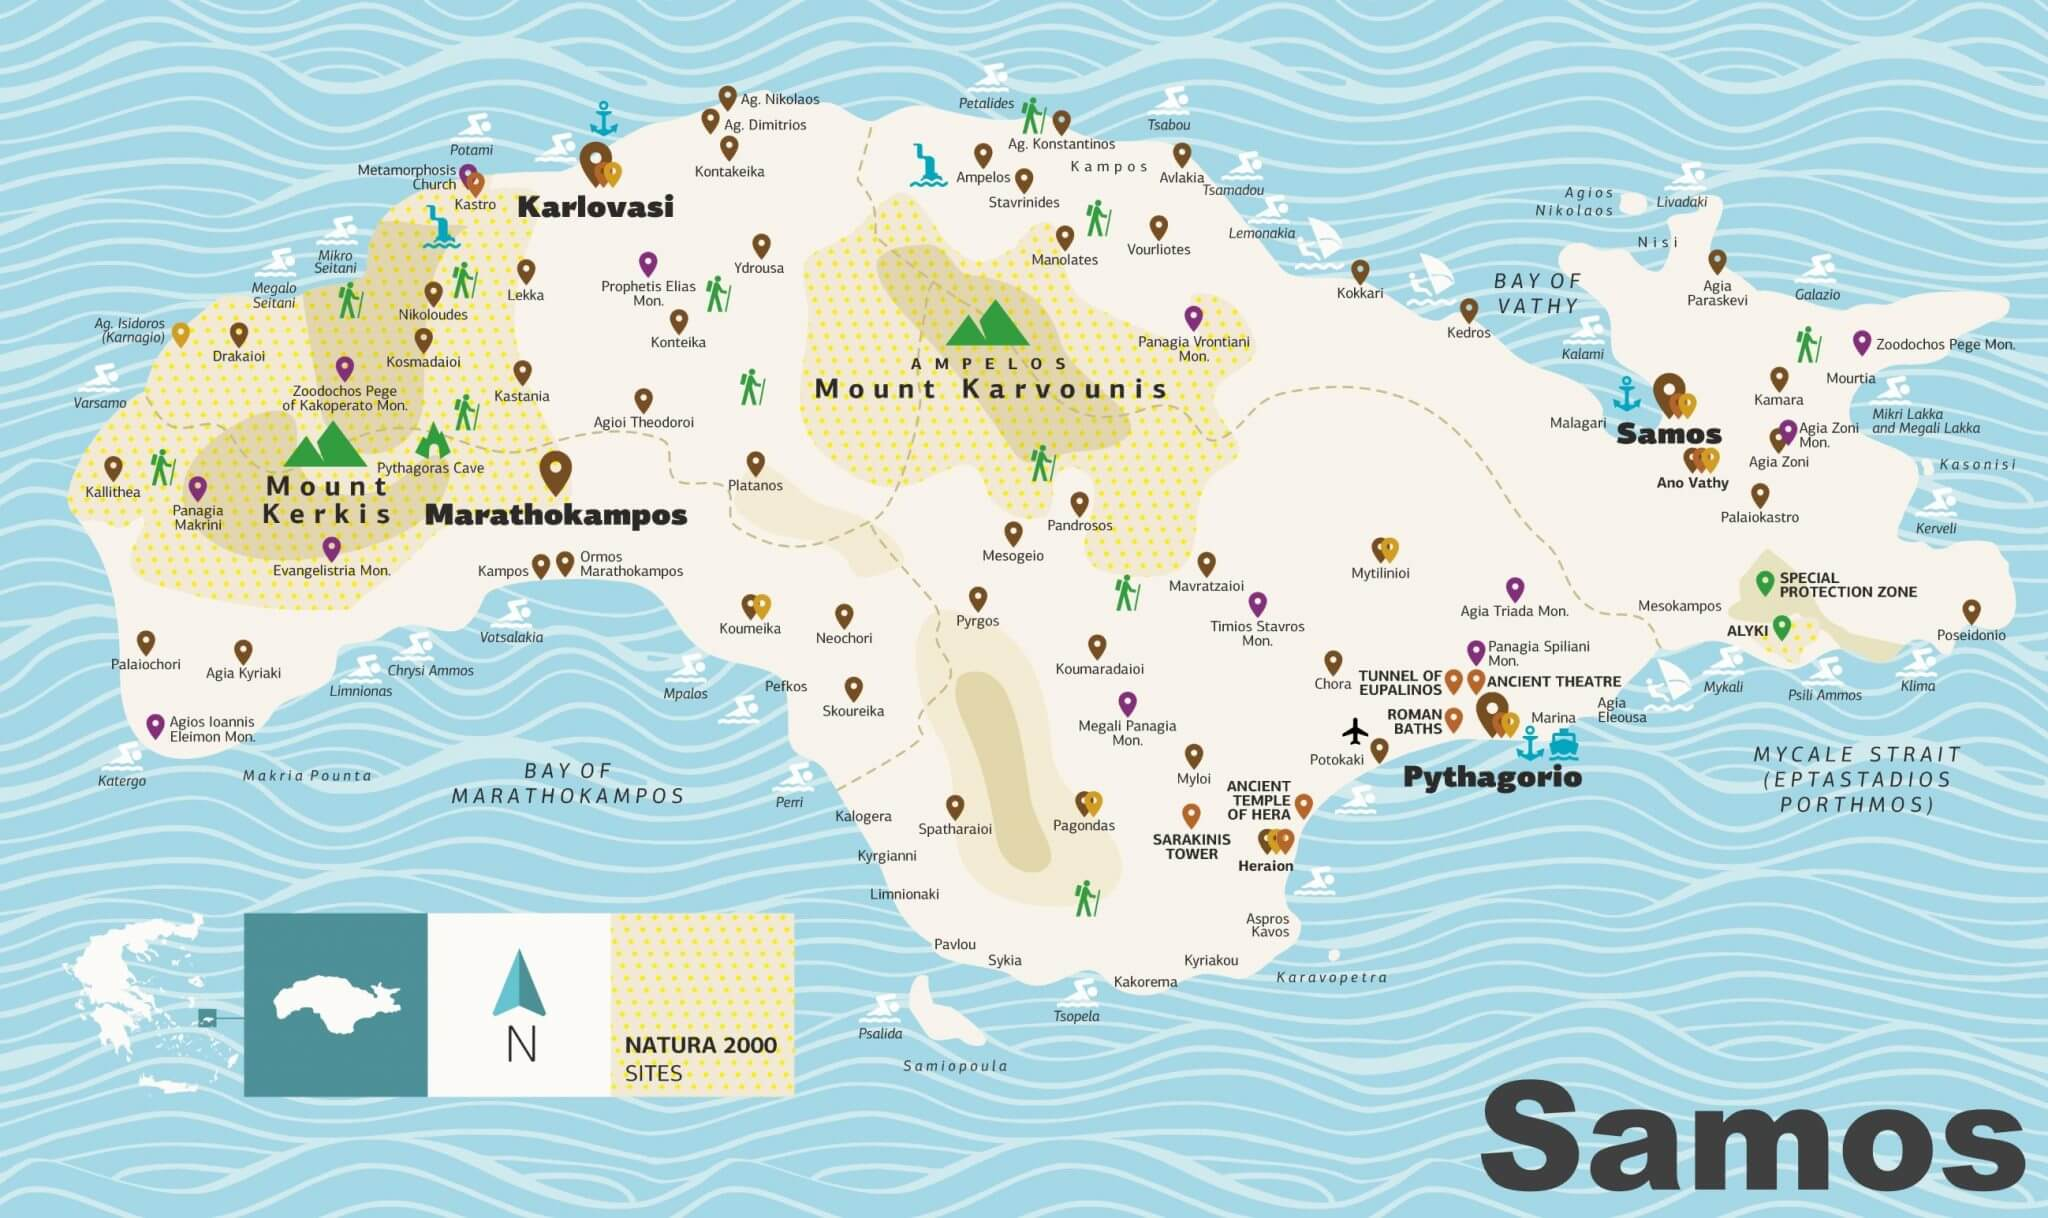 samos map in greece